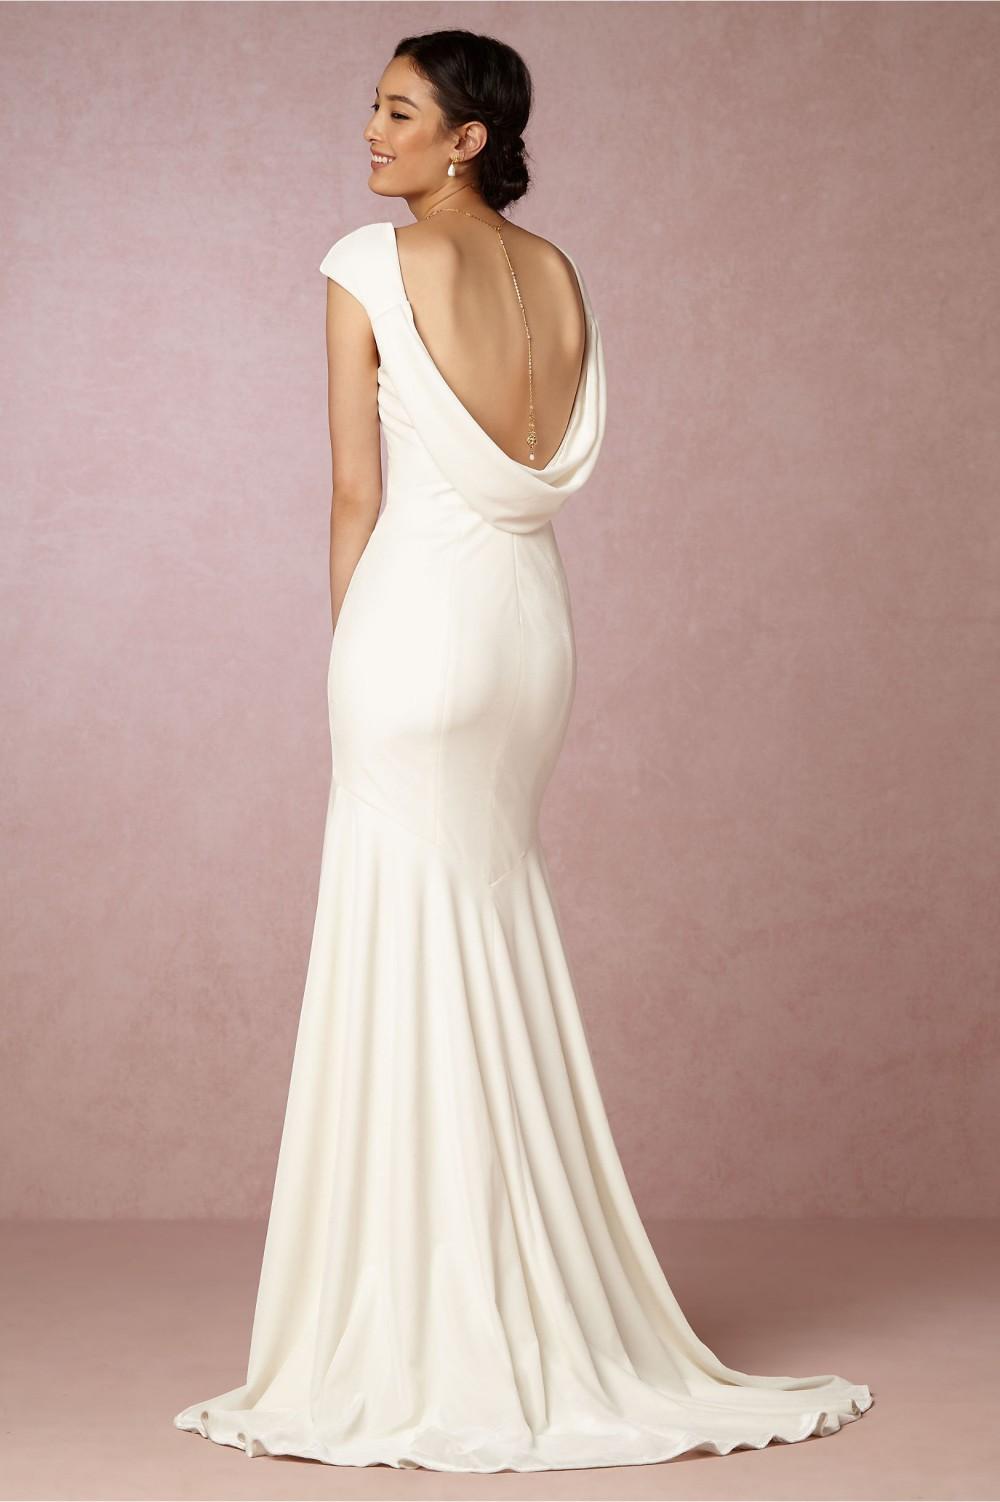 20 Beautiful Wedding Dresses Under 1000 That Look